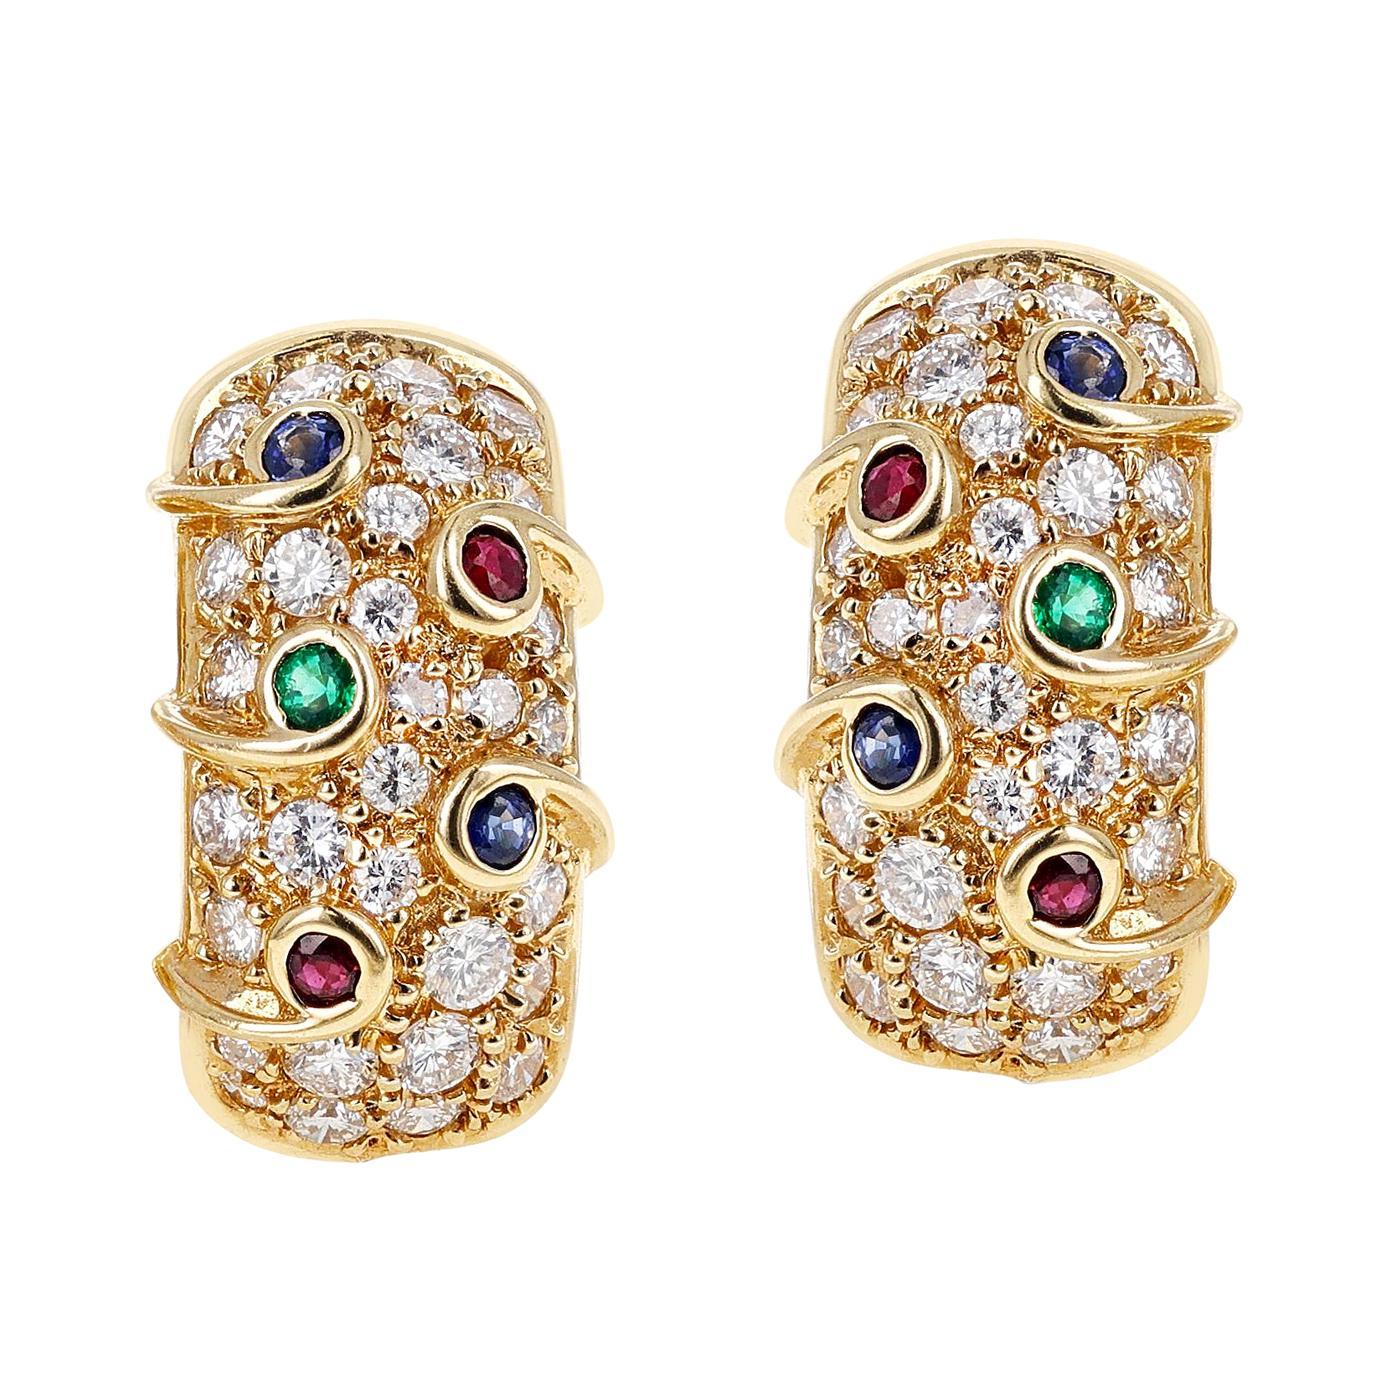 Diamond, Ruby, Emerald, Sapphire Cocktail Clip-On Earrings, 18 Karat Yellow Gold